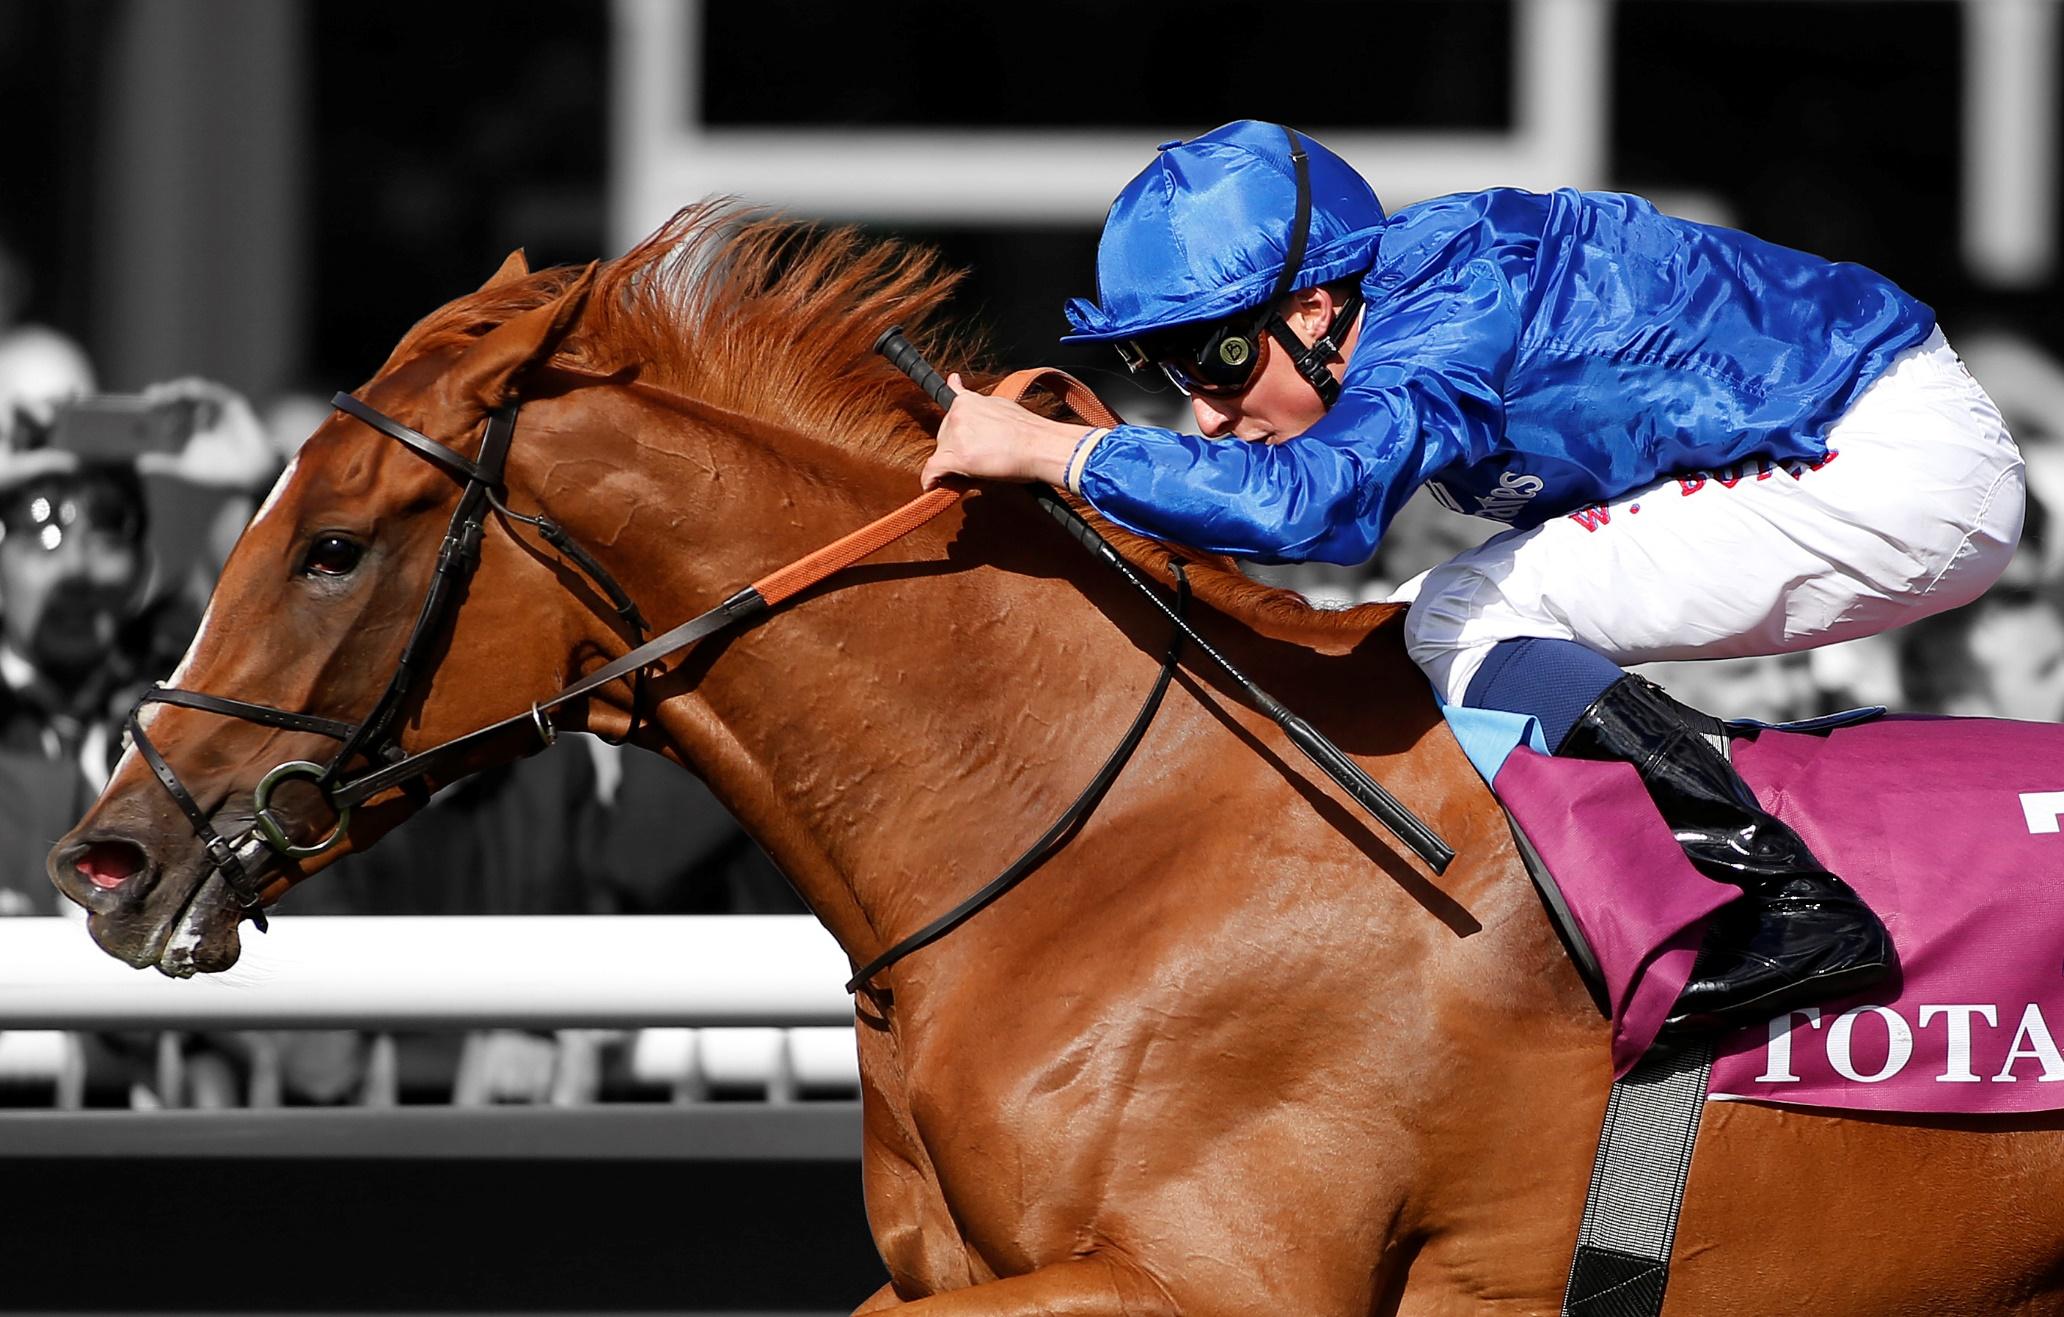 Qatar Prix de L'Arc de Triomphe - Longchamp Racecourse, ParisSaturday 3 & Sunday 4 October 2020